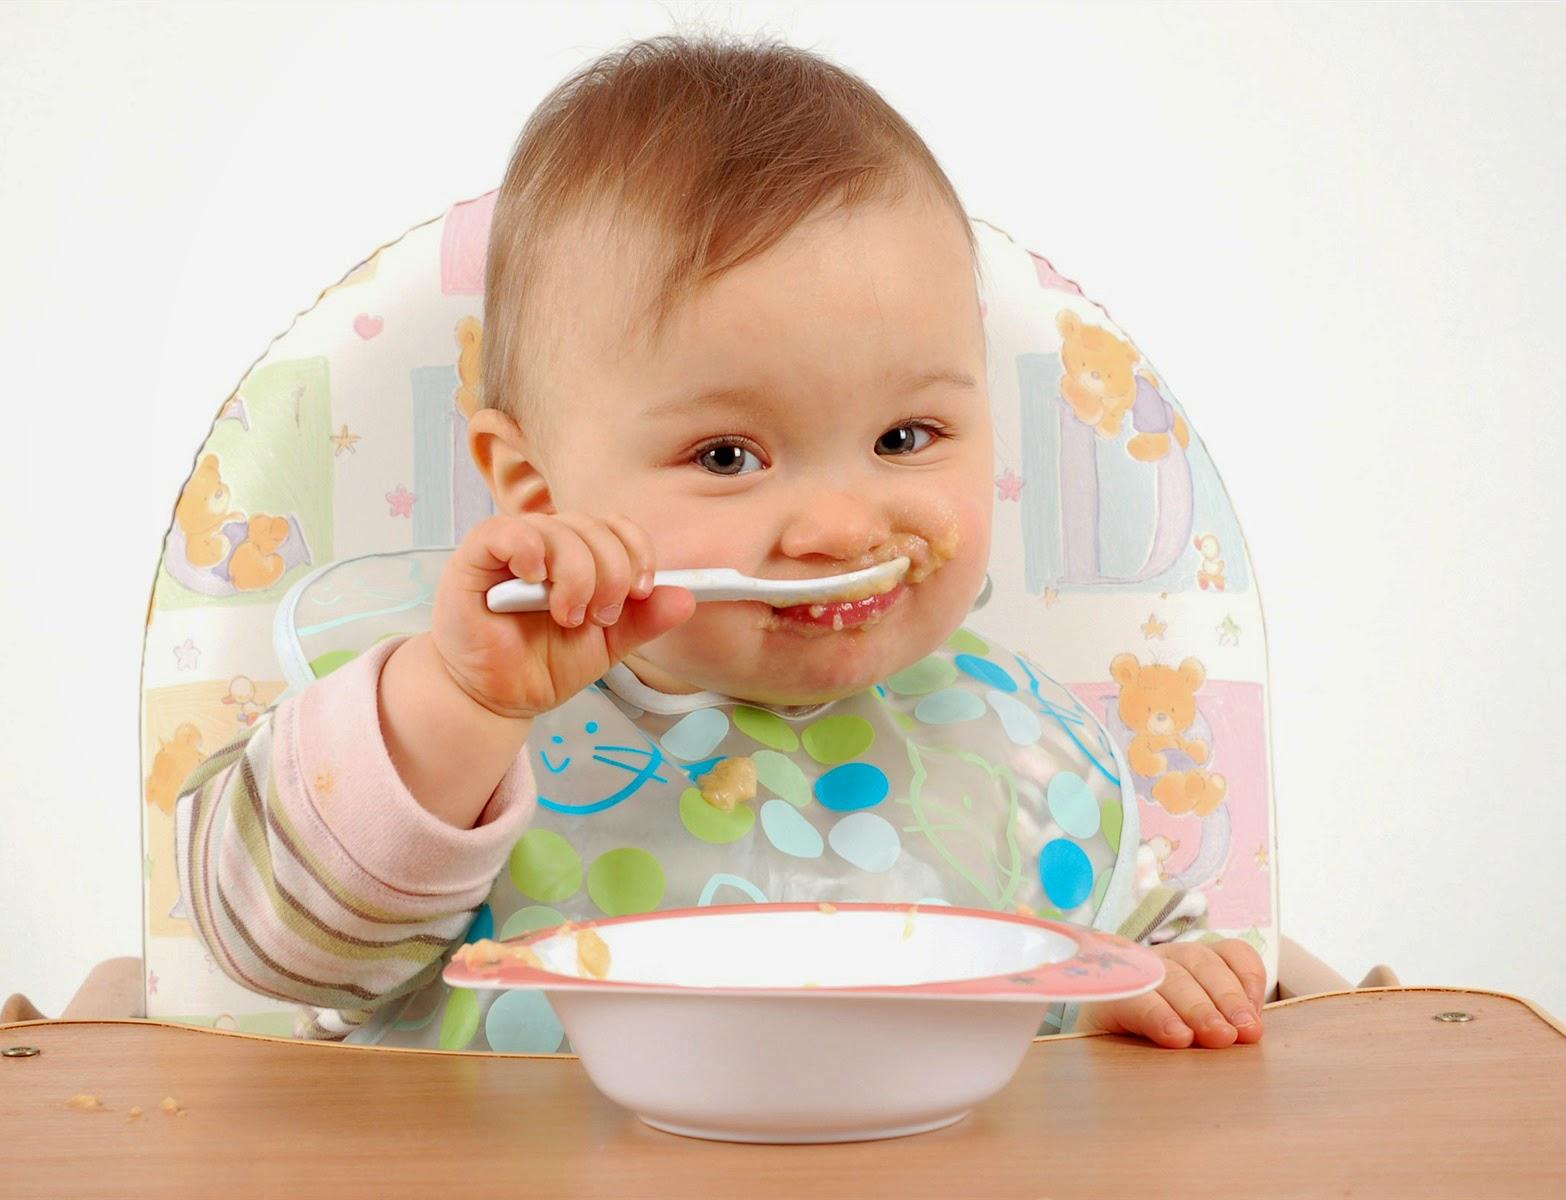 Gambar bayi lucu dan sehat